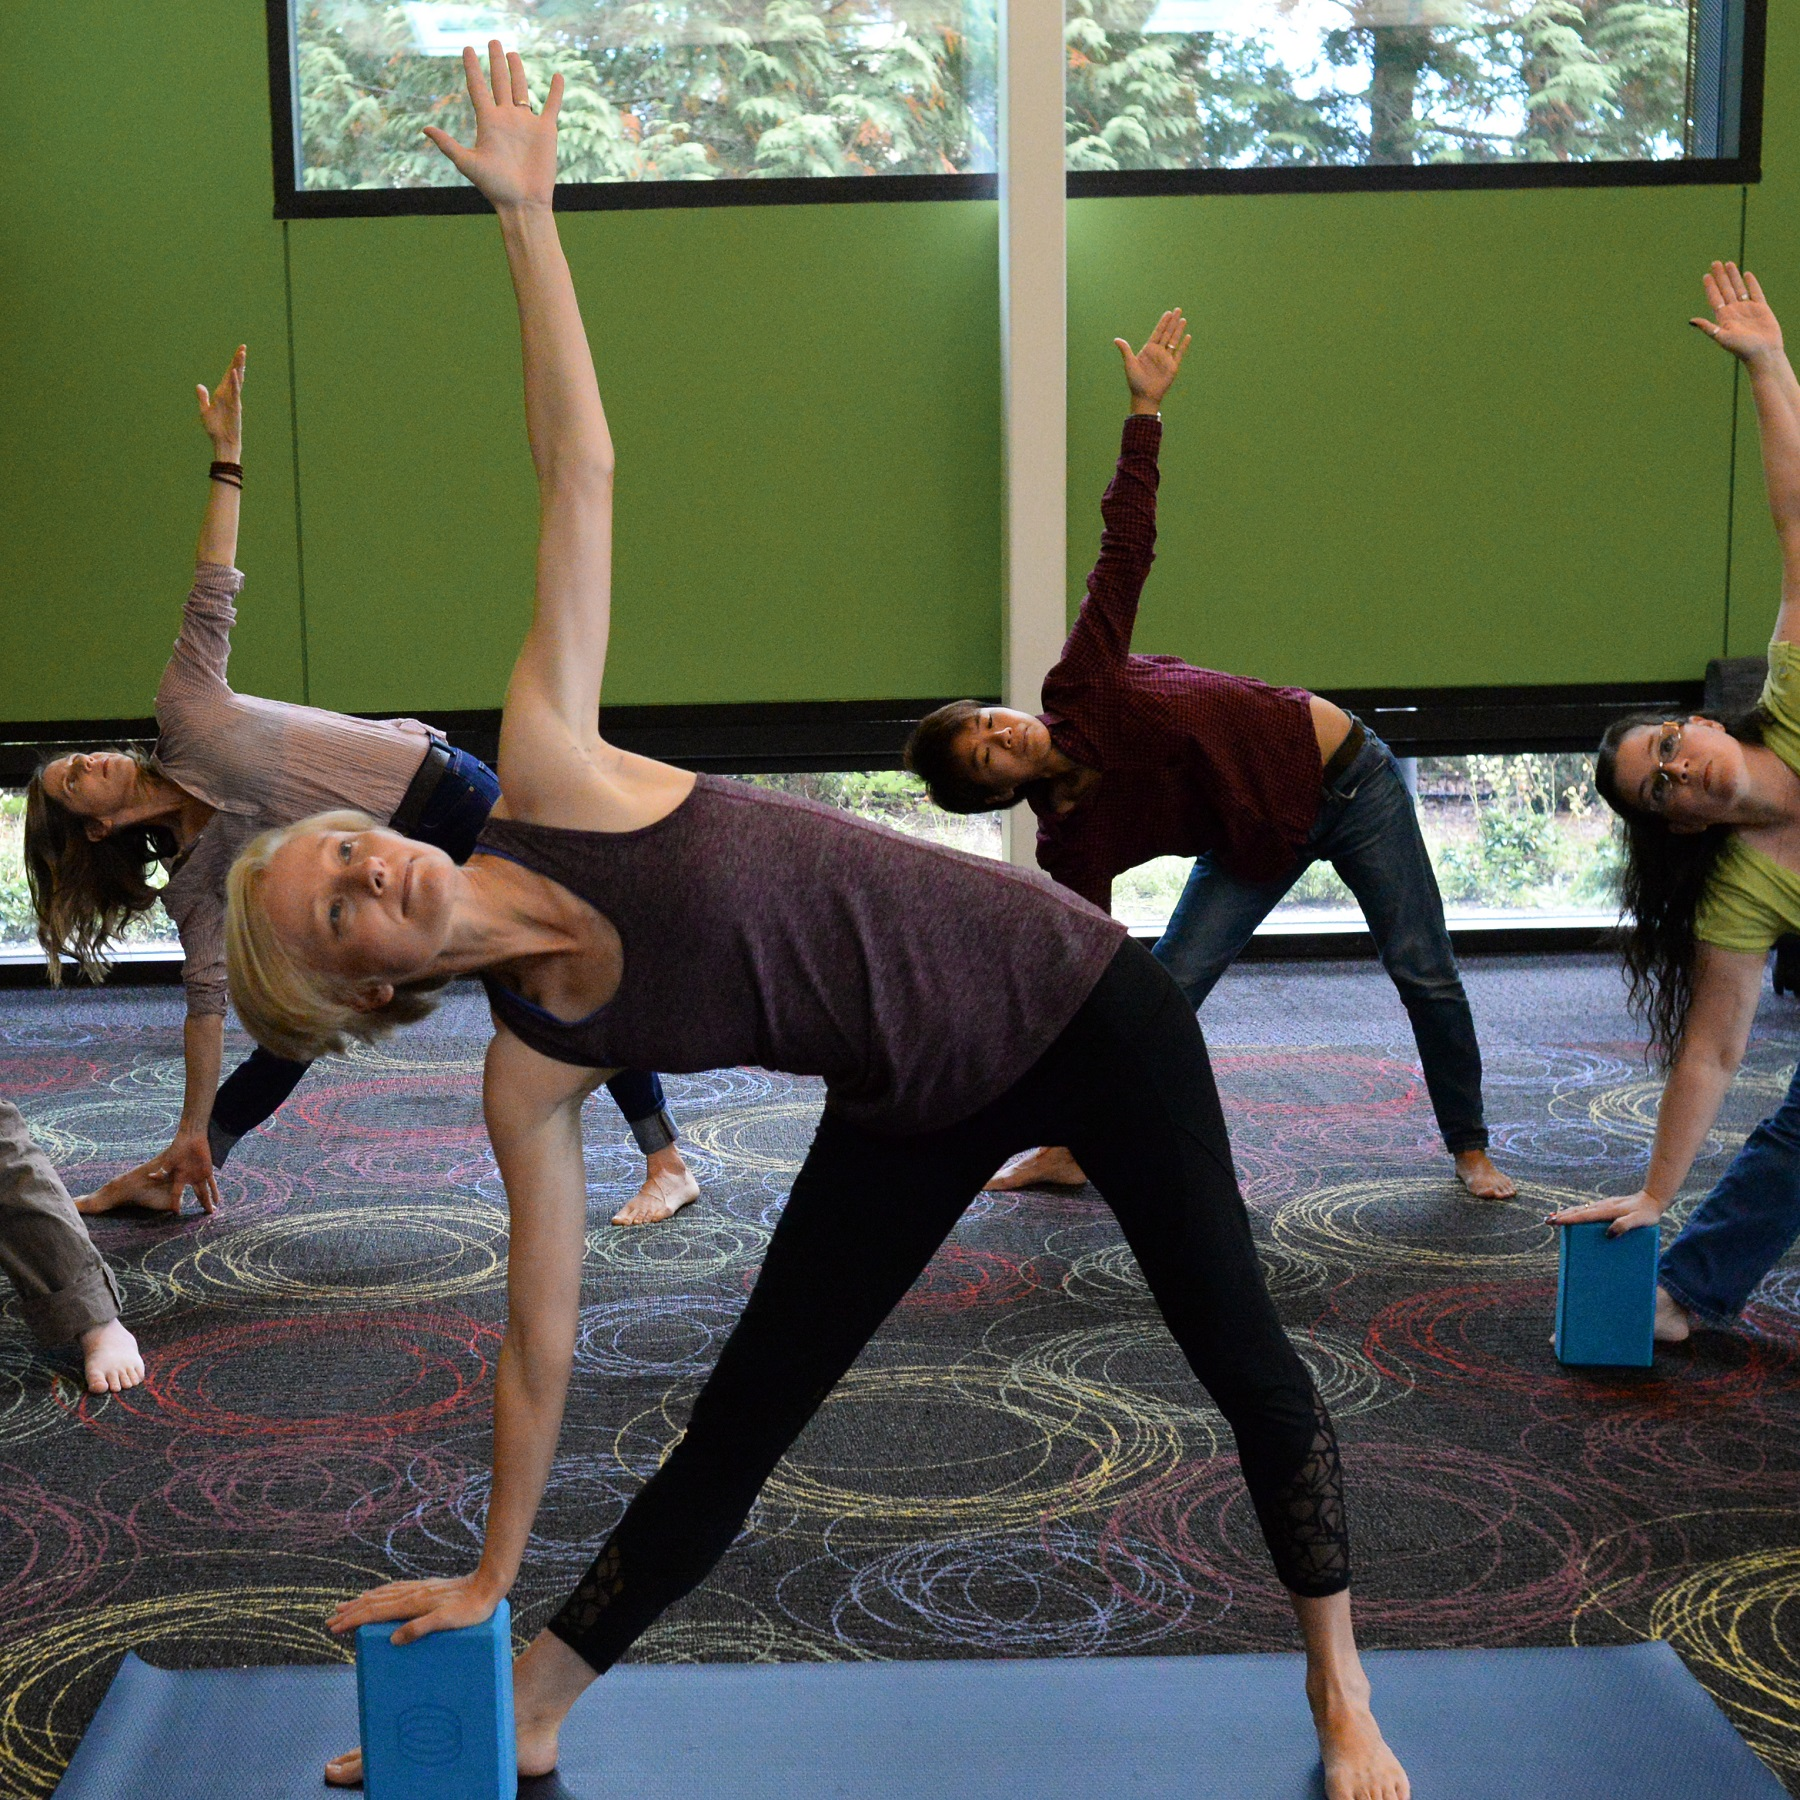 find-time-wellness-yoga-thriveon.jpg